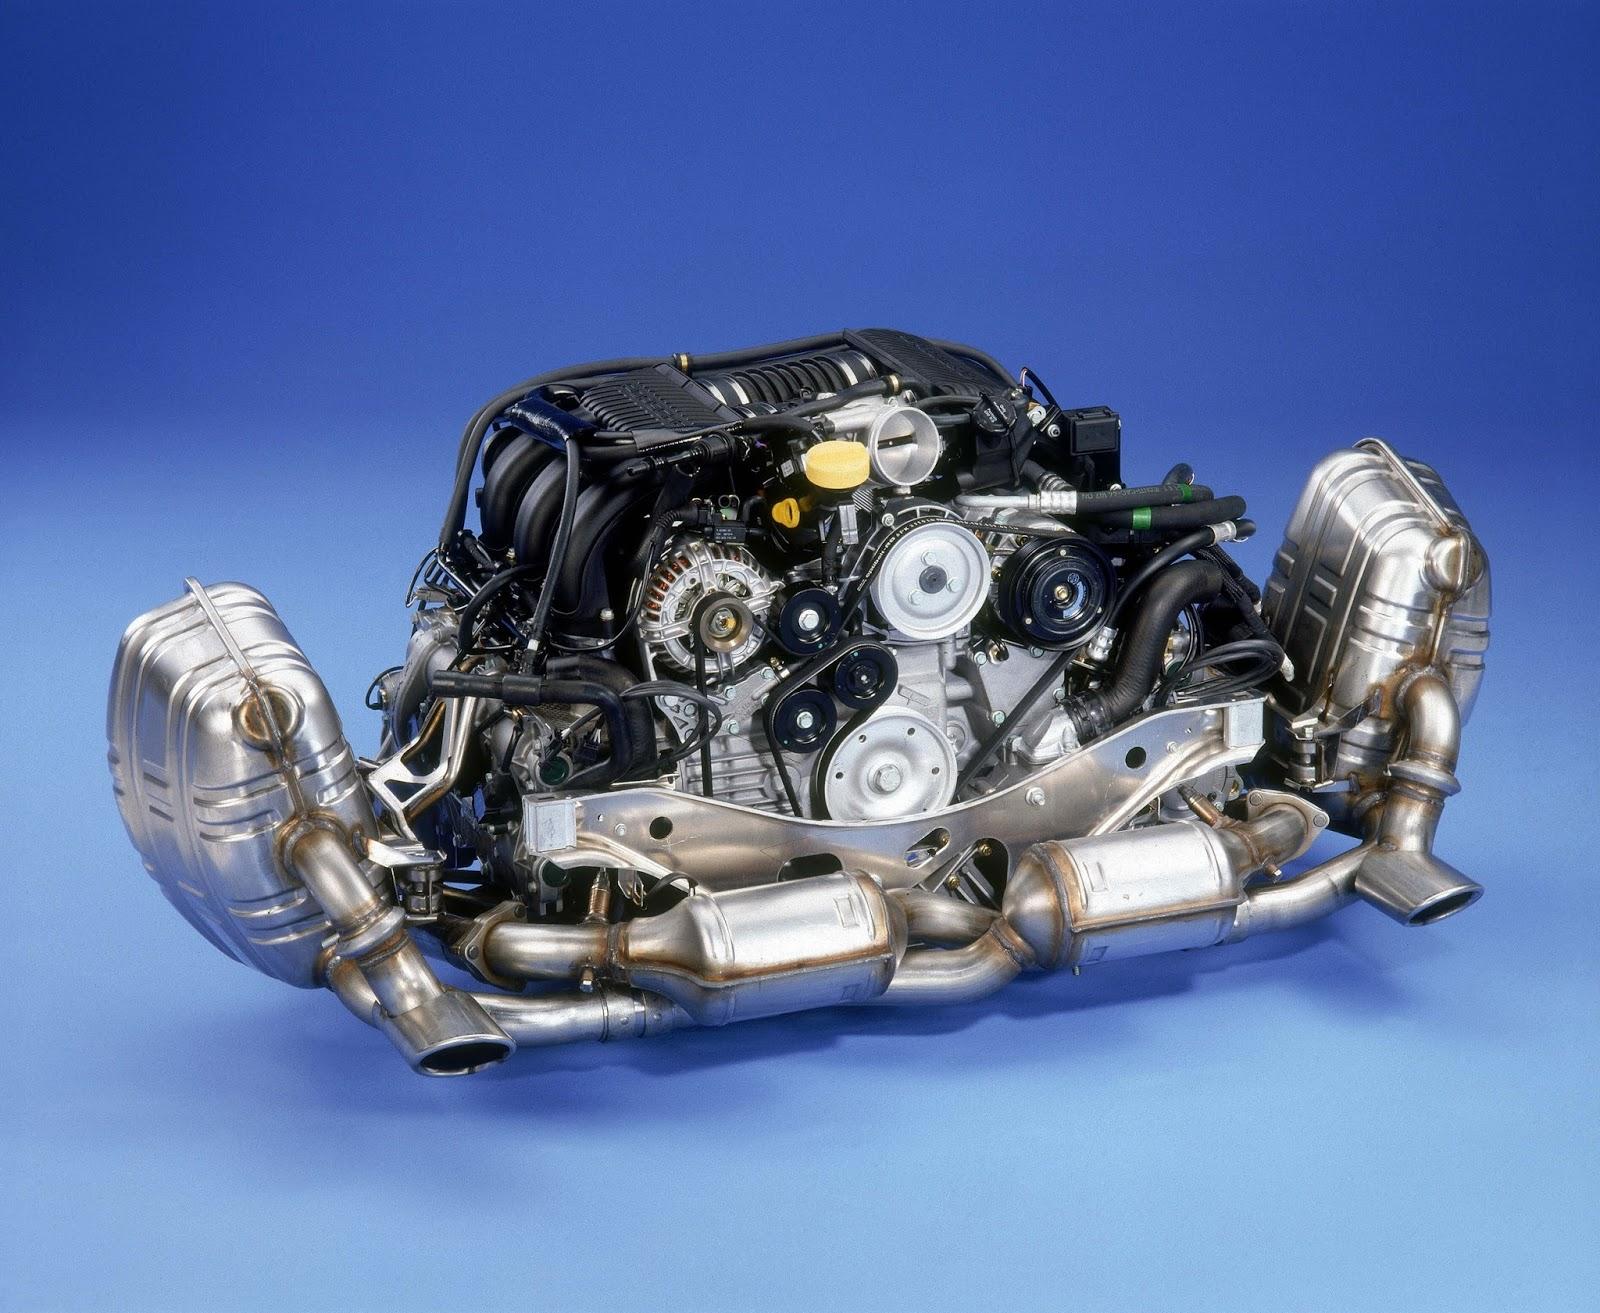 Speedmonkey Porsche Flat 6 Engine 50 Year History Mega Gallery